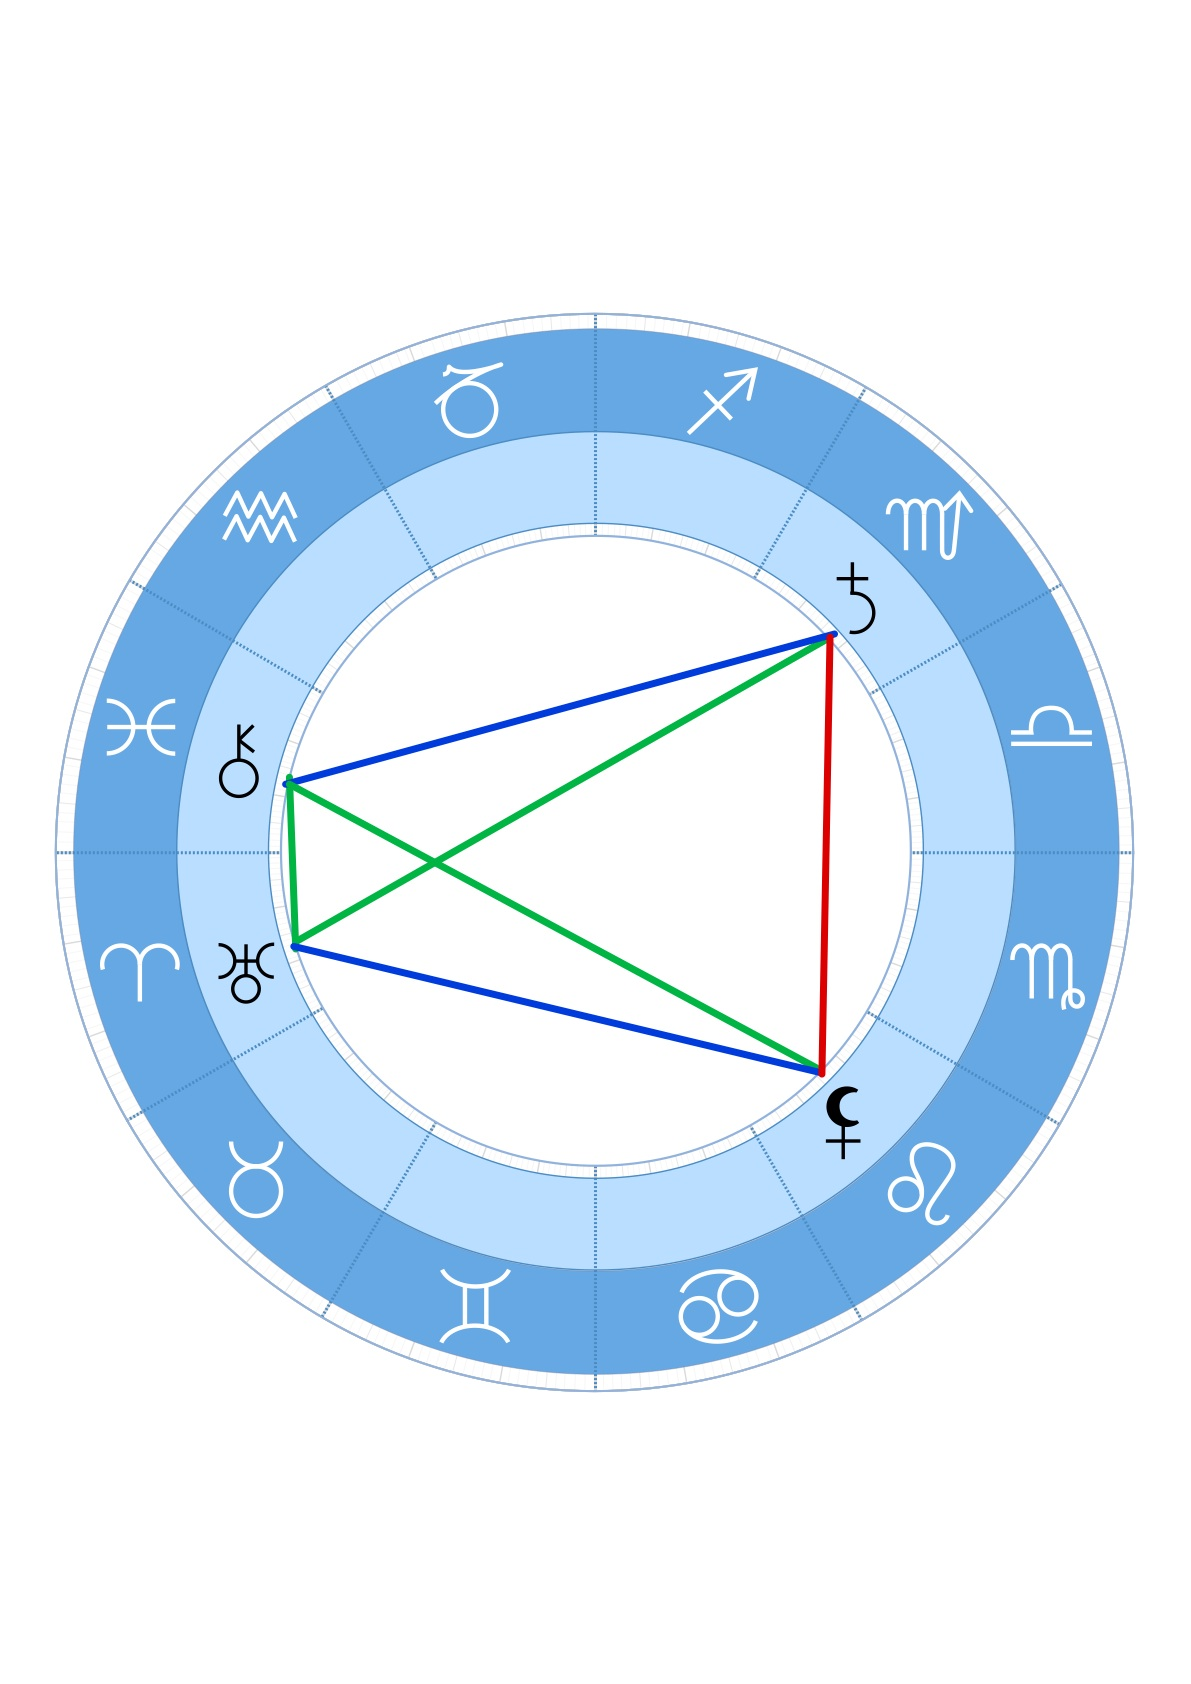 Eris and the South Node | jbuss Astrology